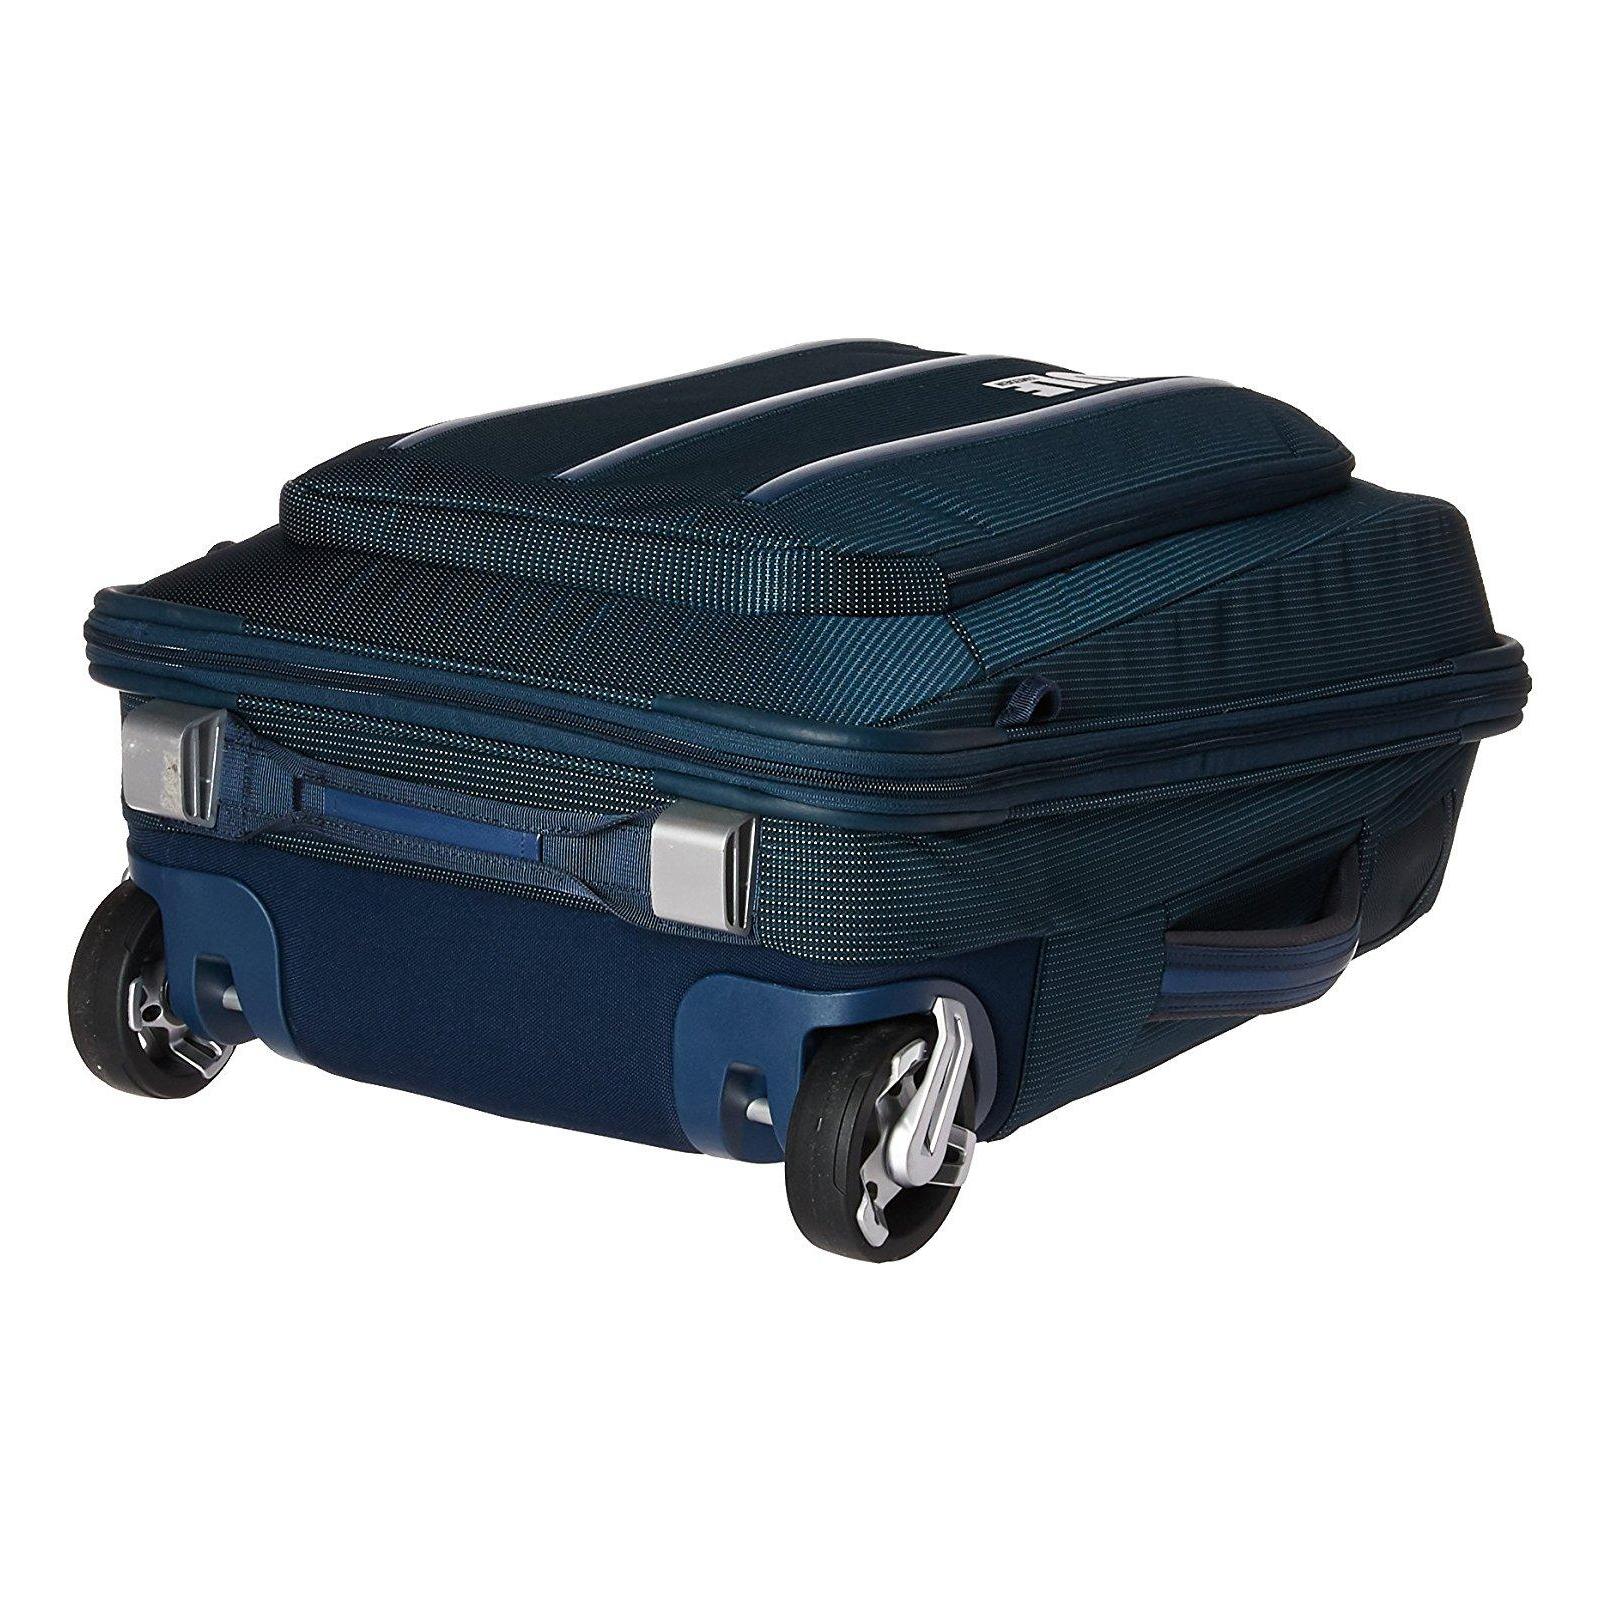 Чемодан Thule Crossover 38L Rolling Carry-On - Dark Blue (TCRU115DB) изображение 5